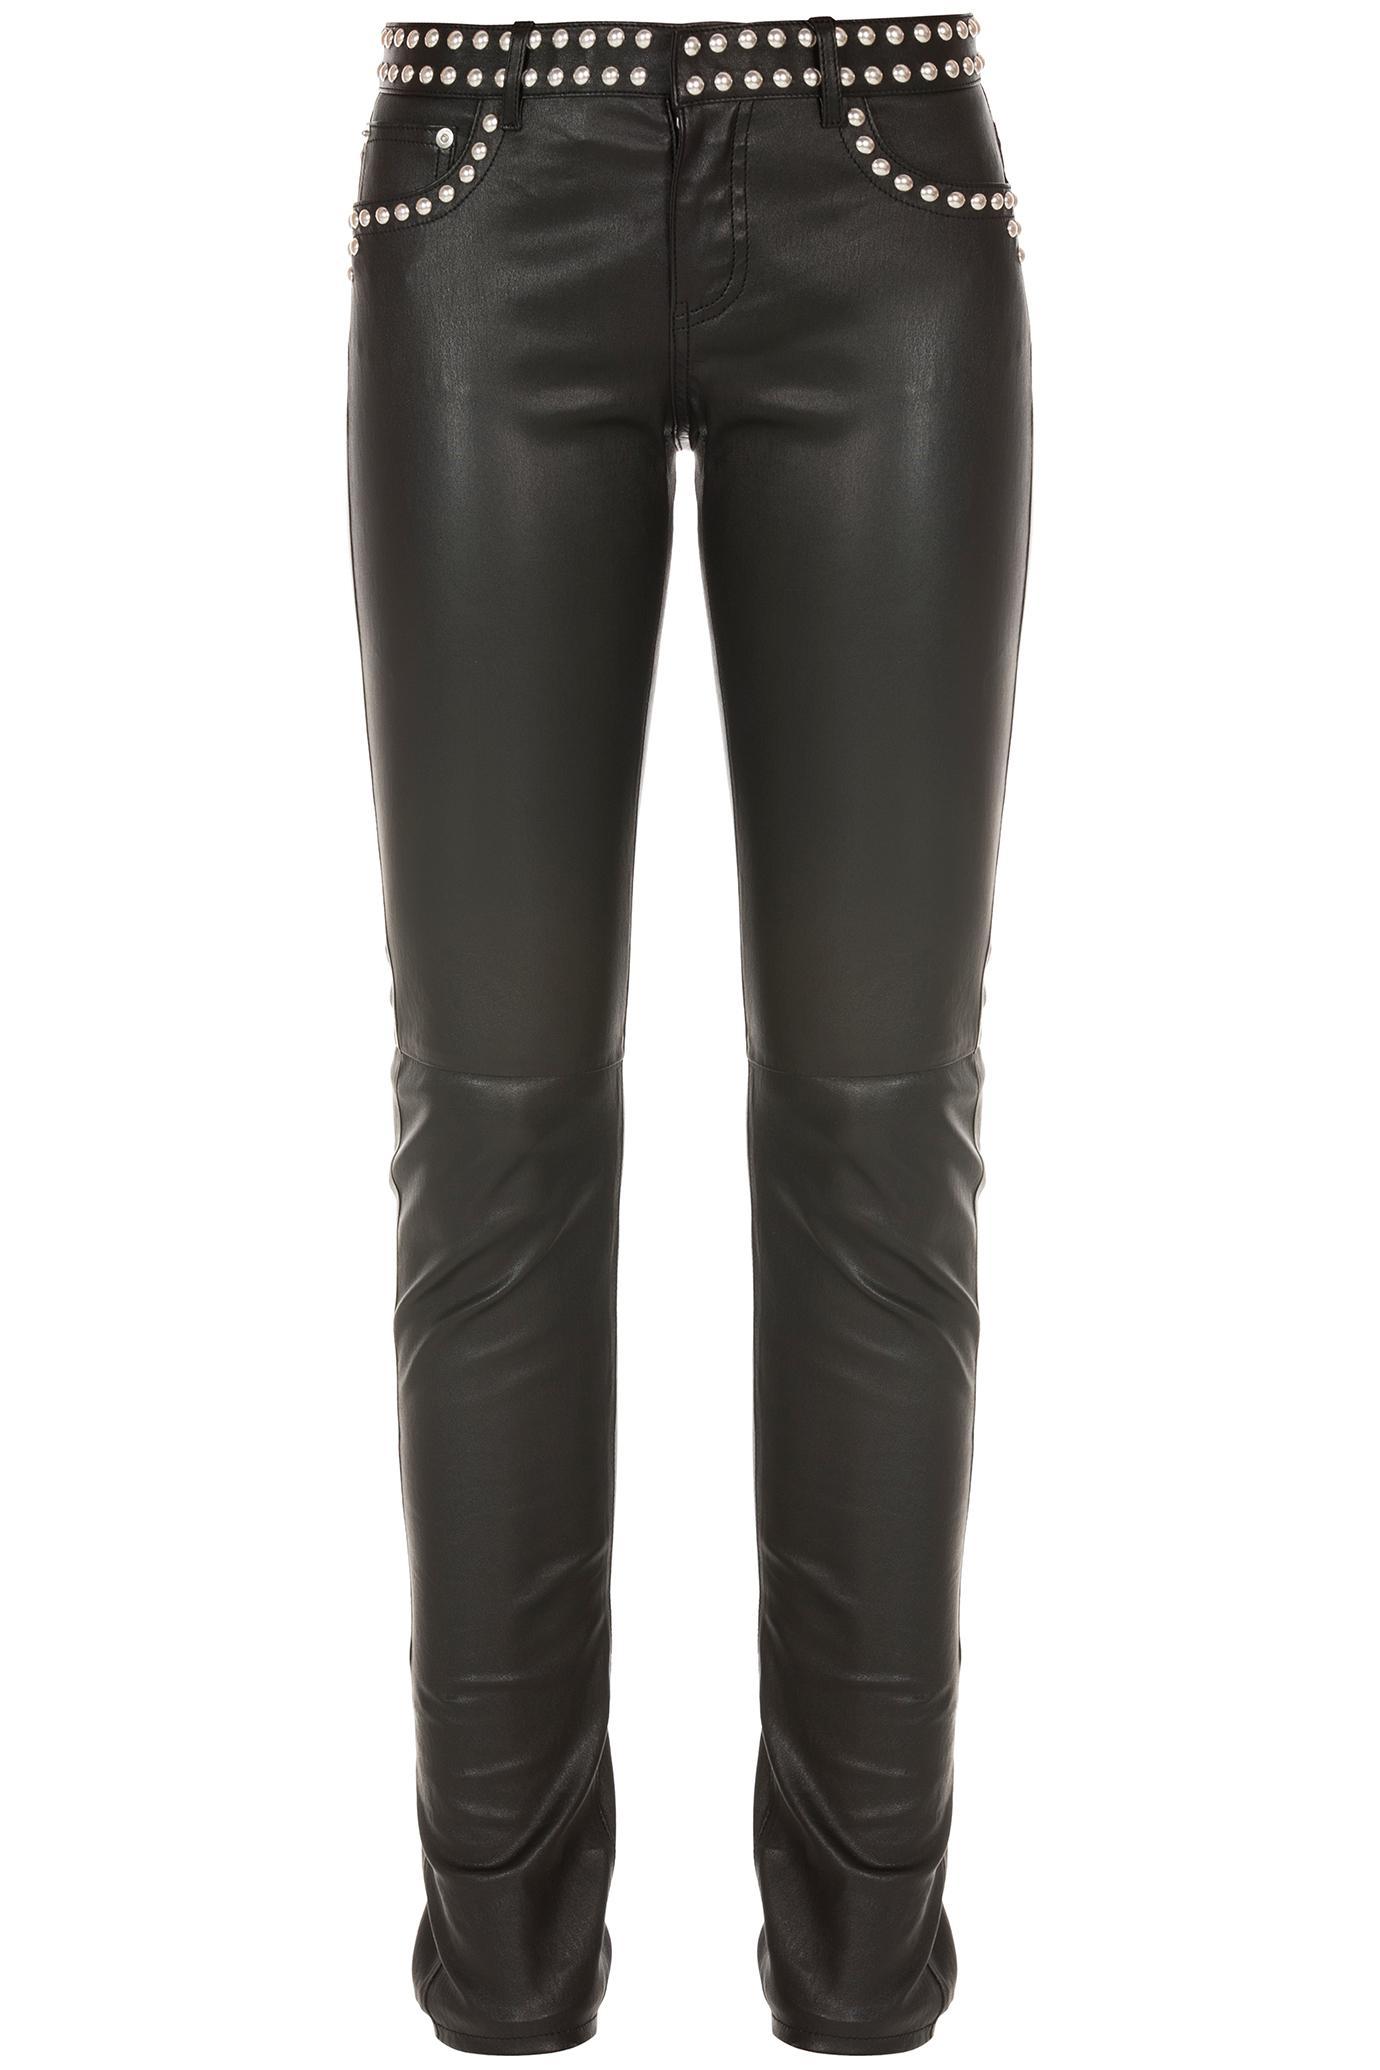 Saint Laurent Studded Leather Pants In Black Lyst